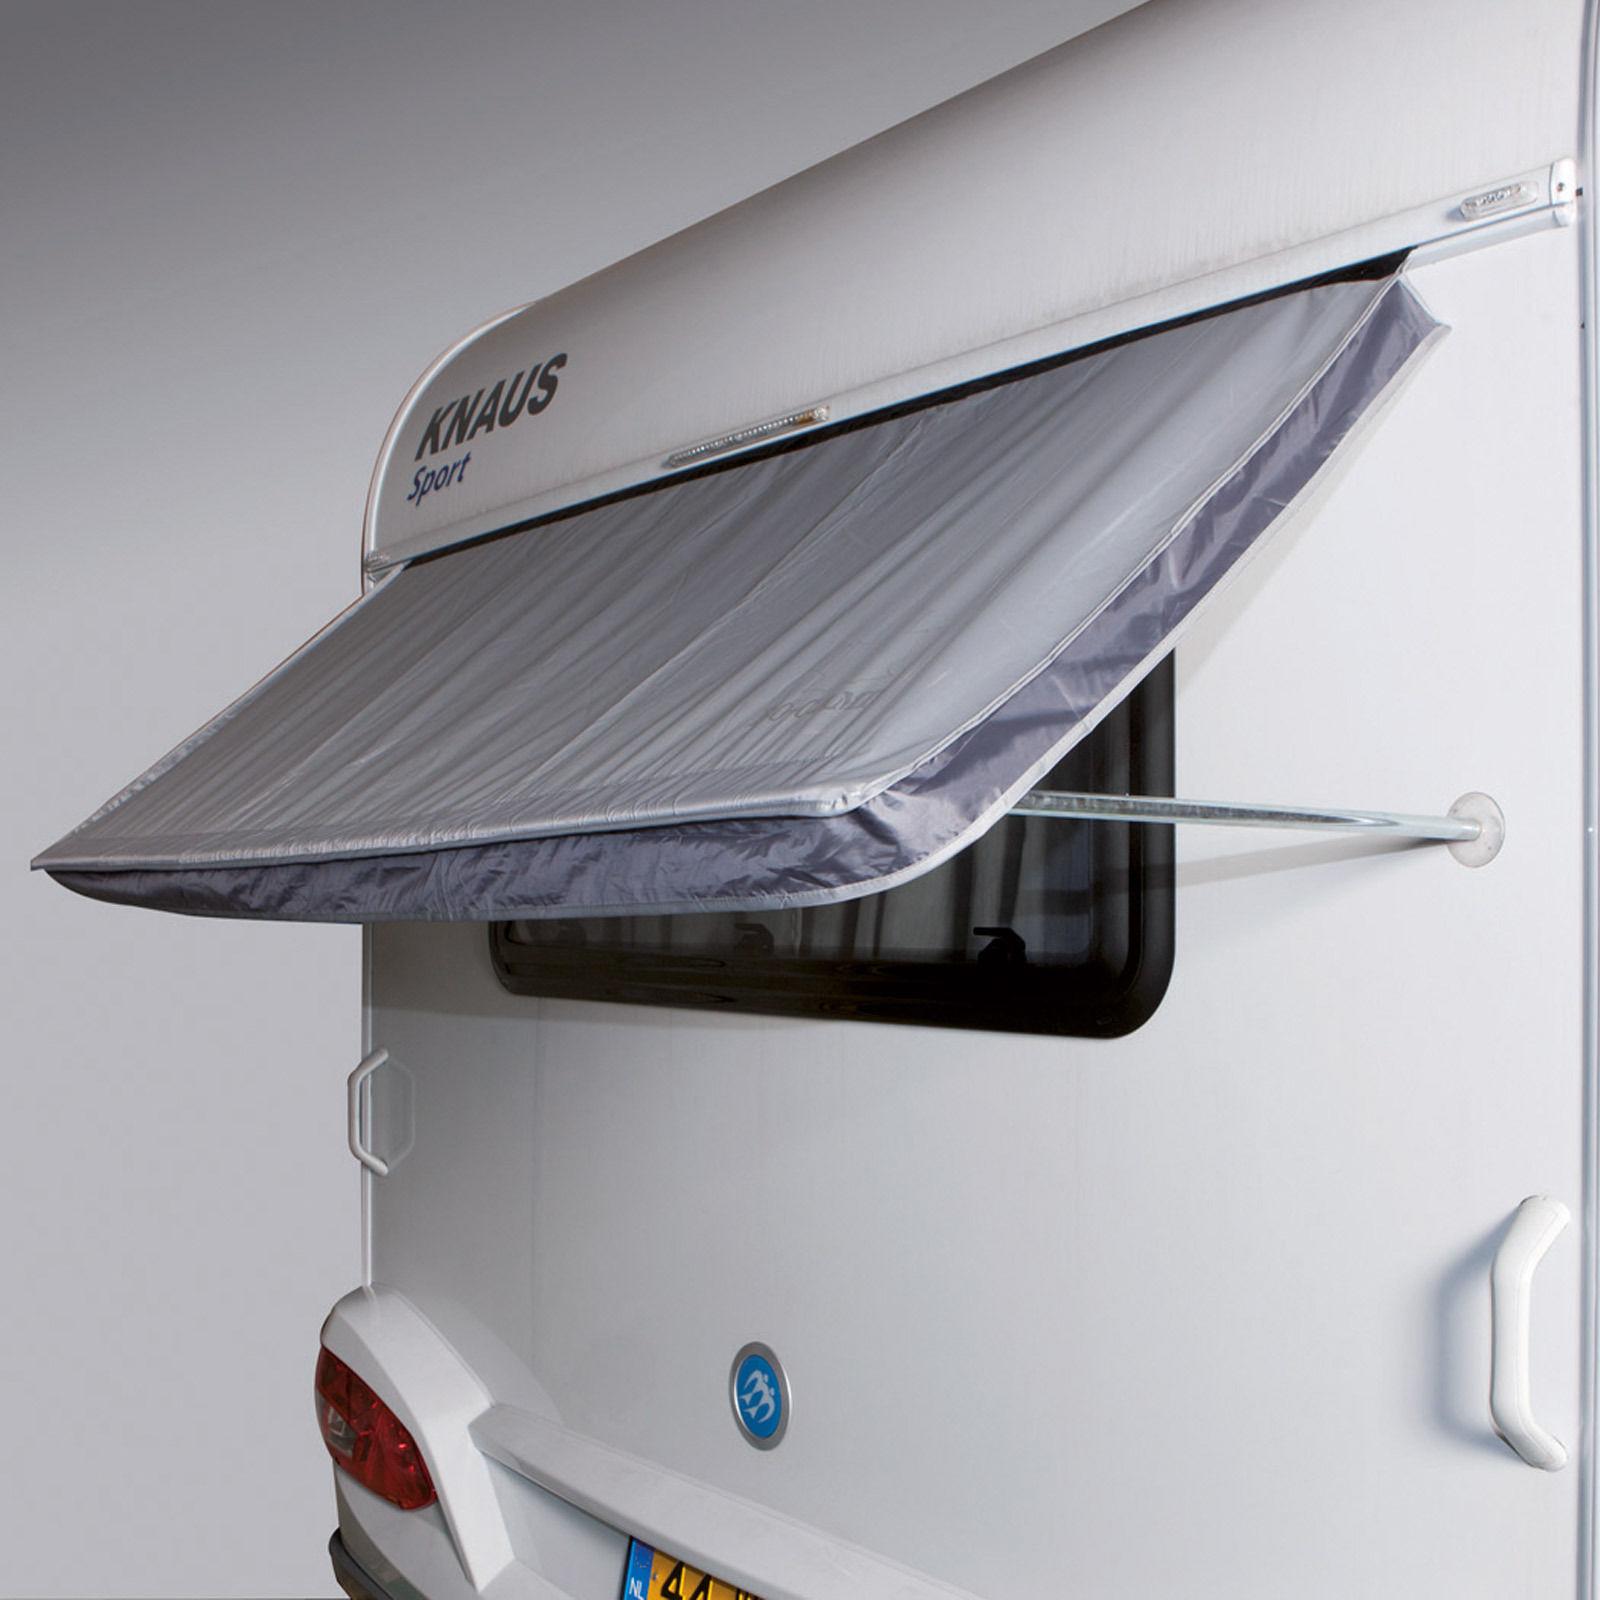 Bo Camp Markise F R Caravan Camping Fenster Sonnen Vordach